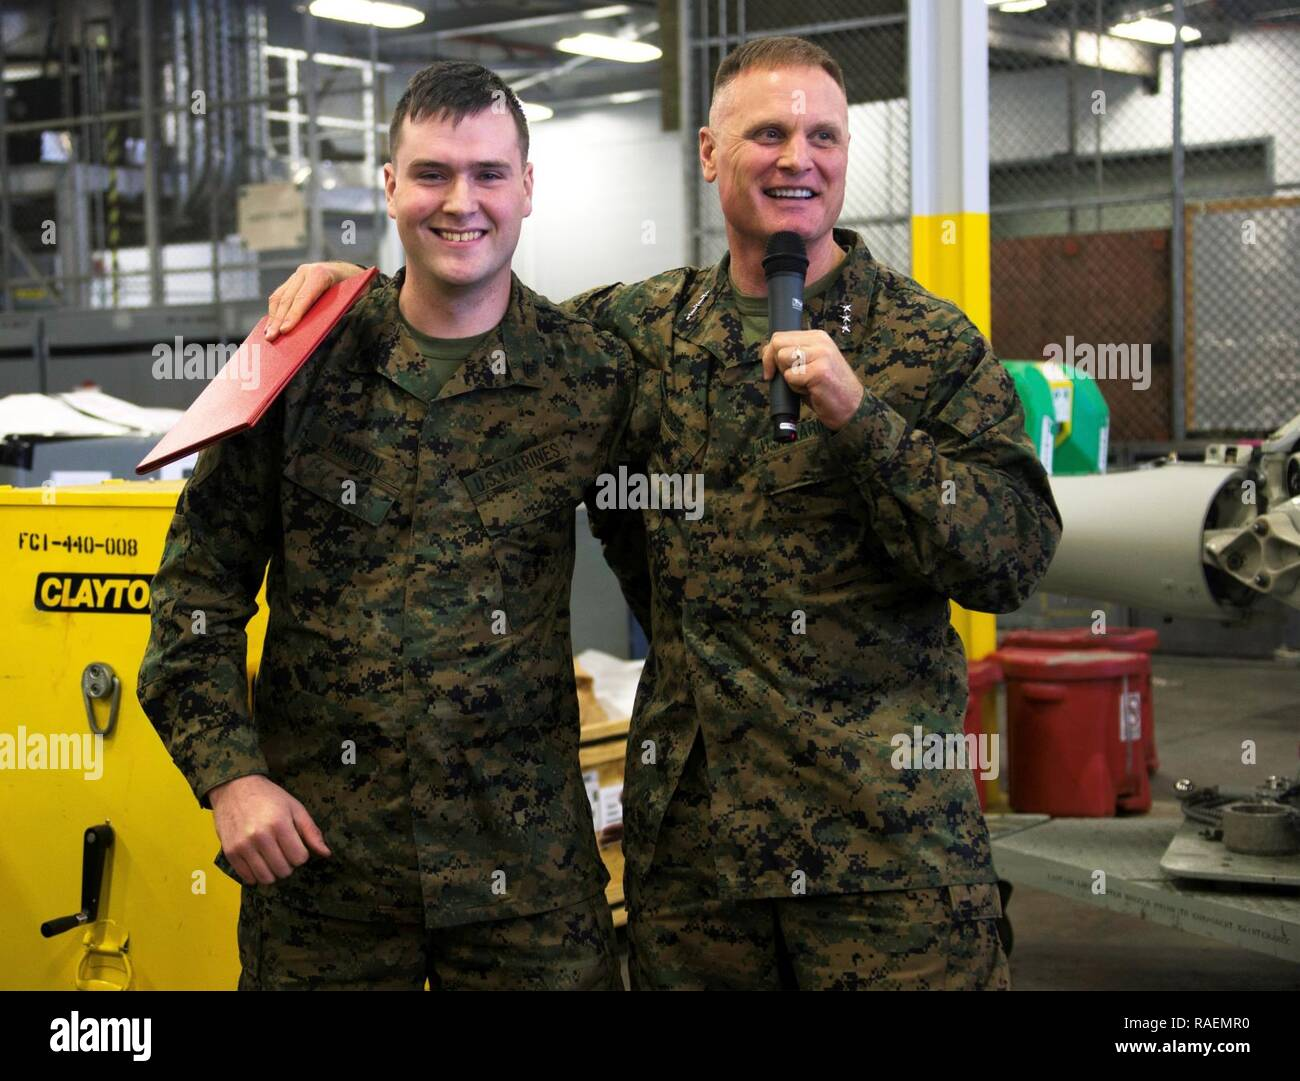 Marine Corps Boots Stock Photos & Marine Corps Boots Stock